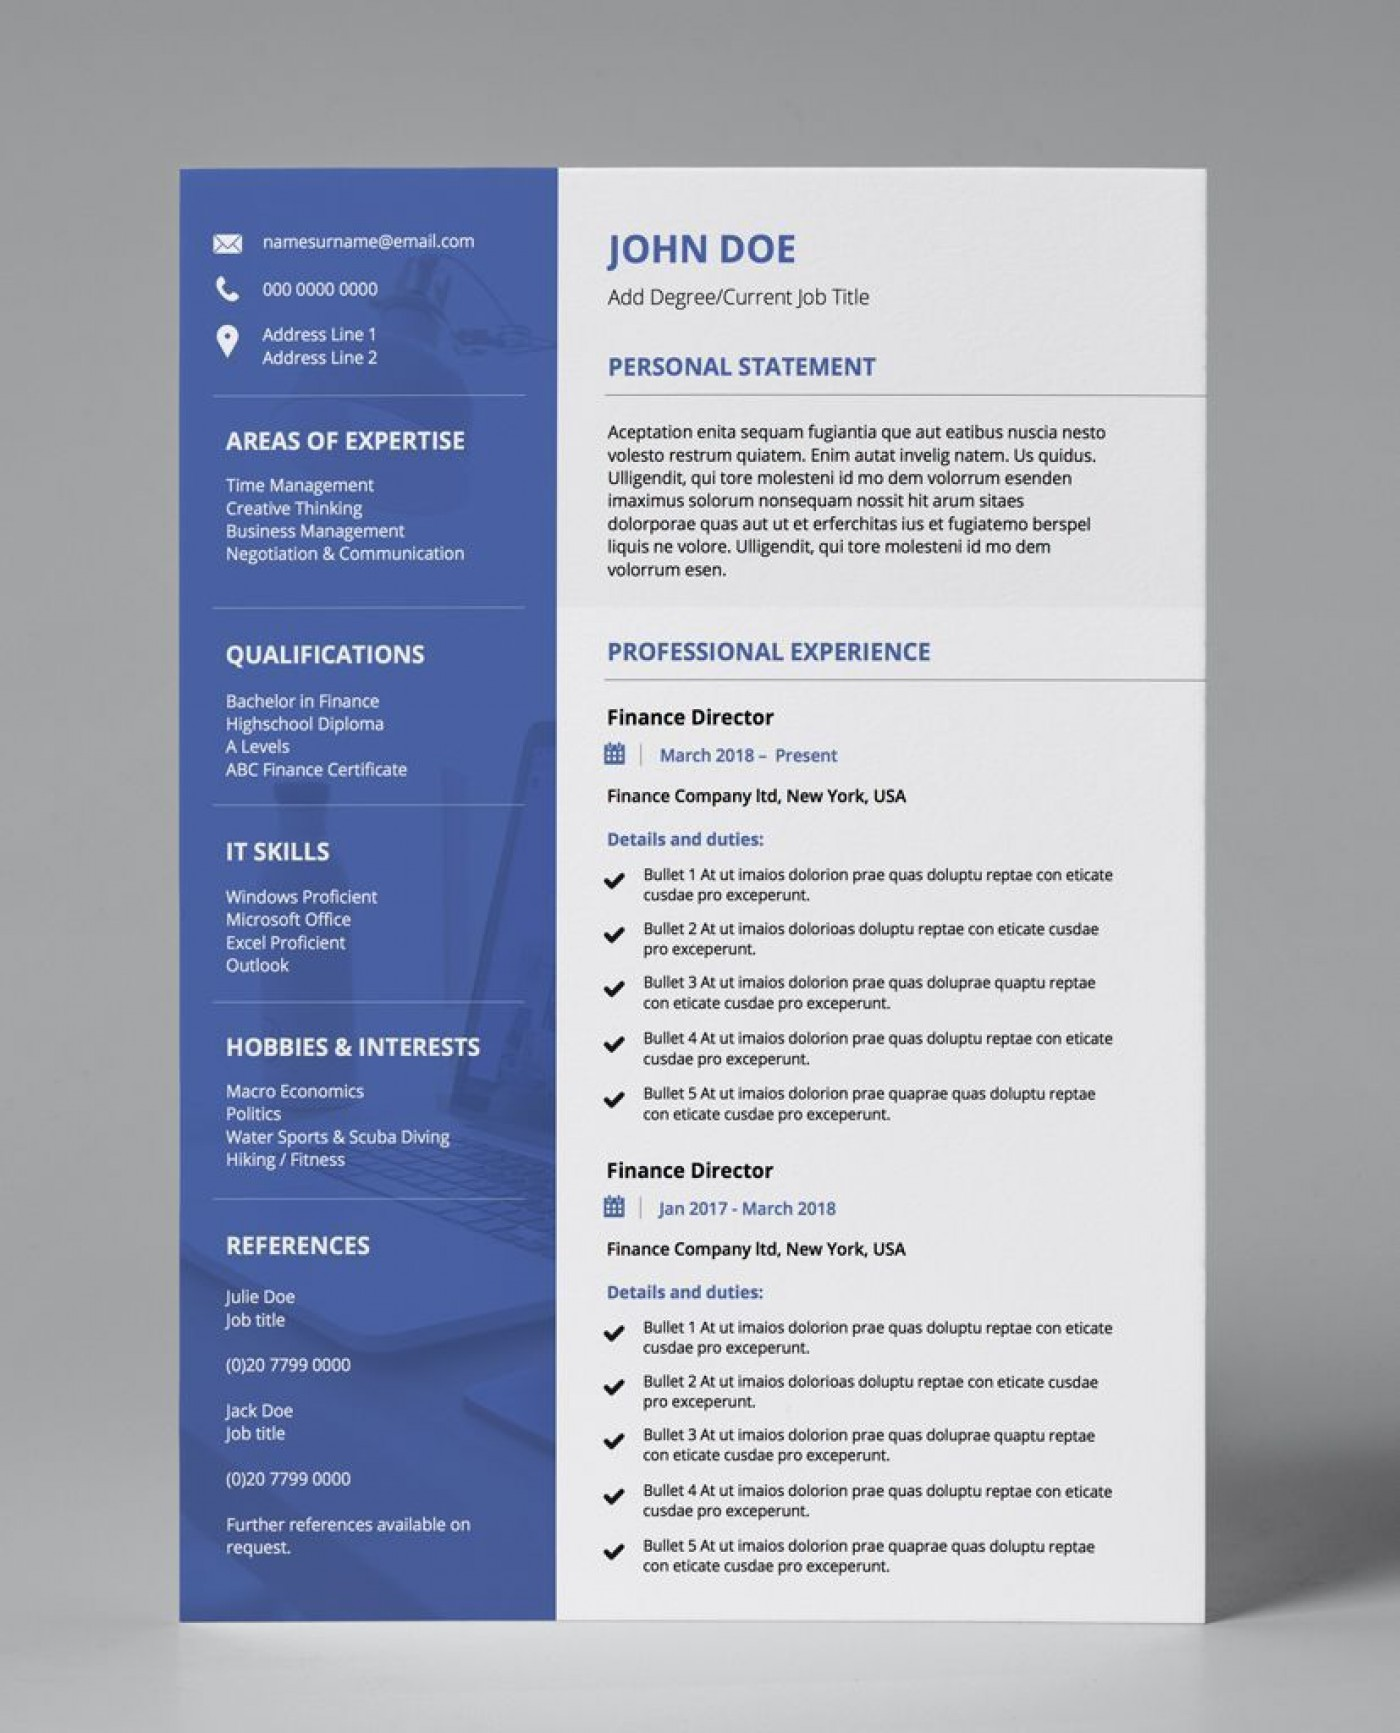 001 Singular Professional Cv Template Free Online Idea  Resume1400